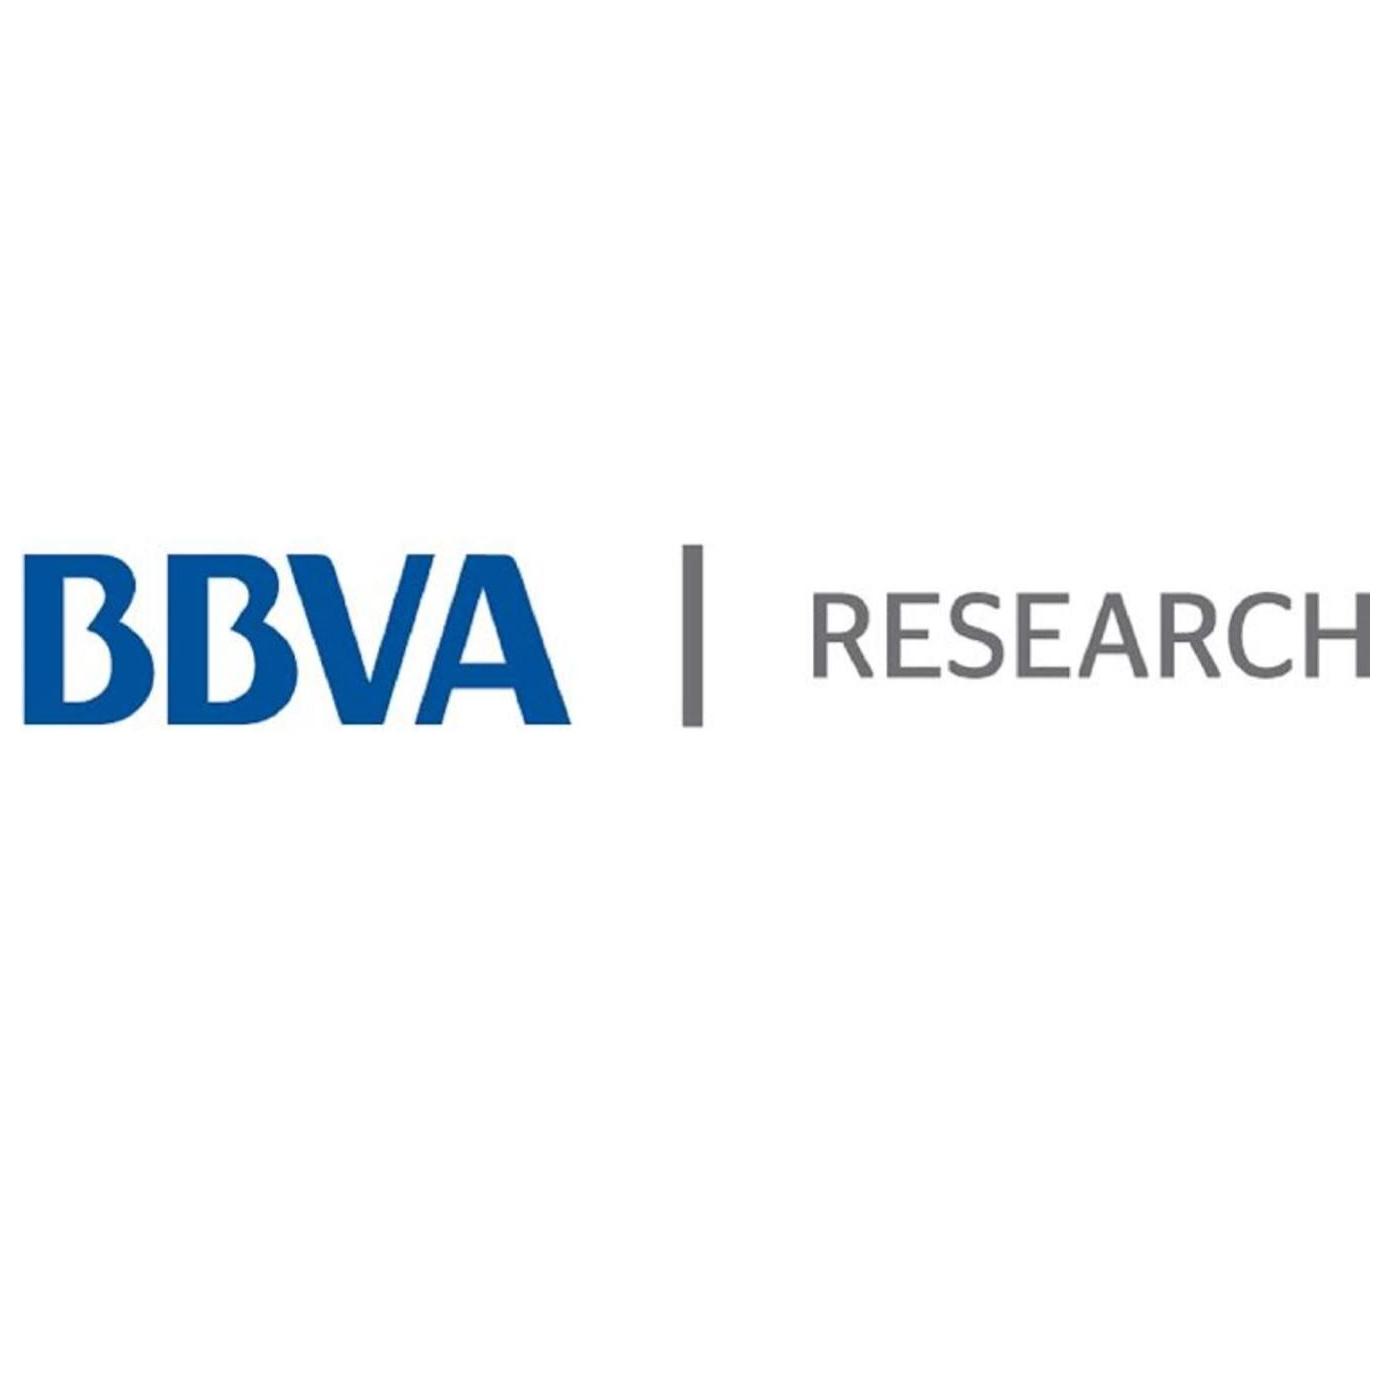 bbva_podcast_logo